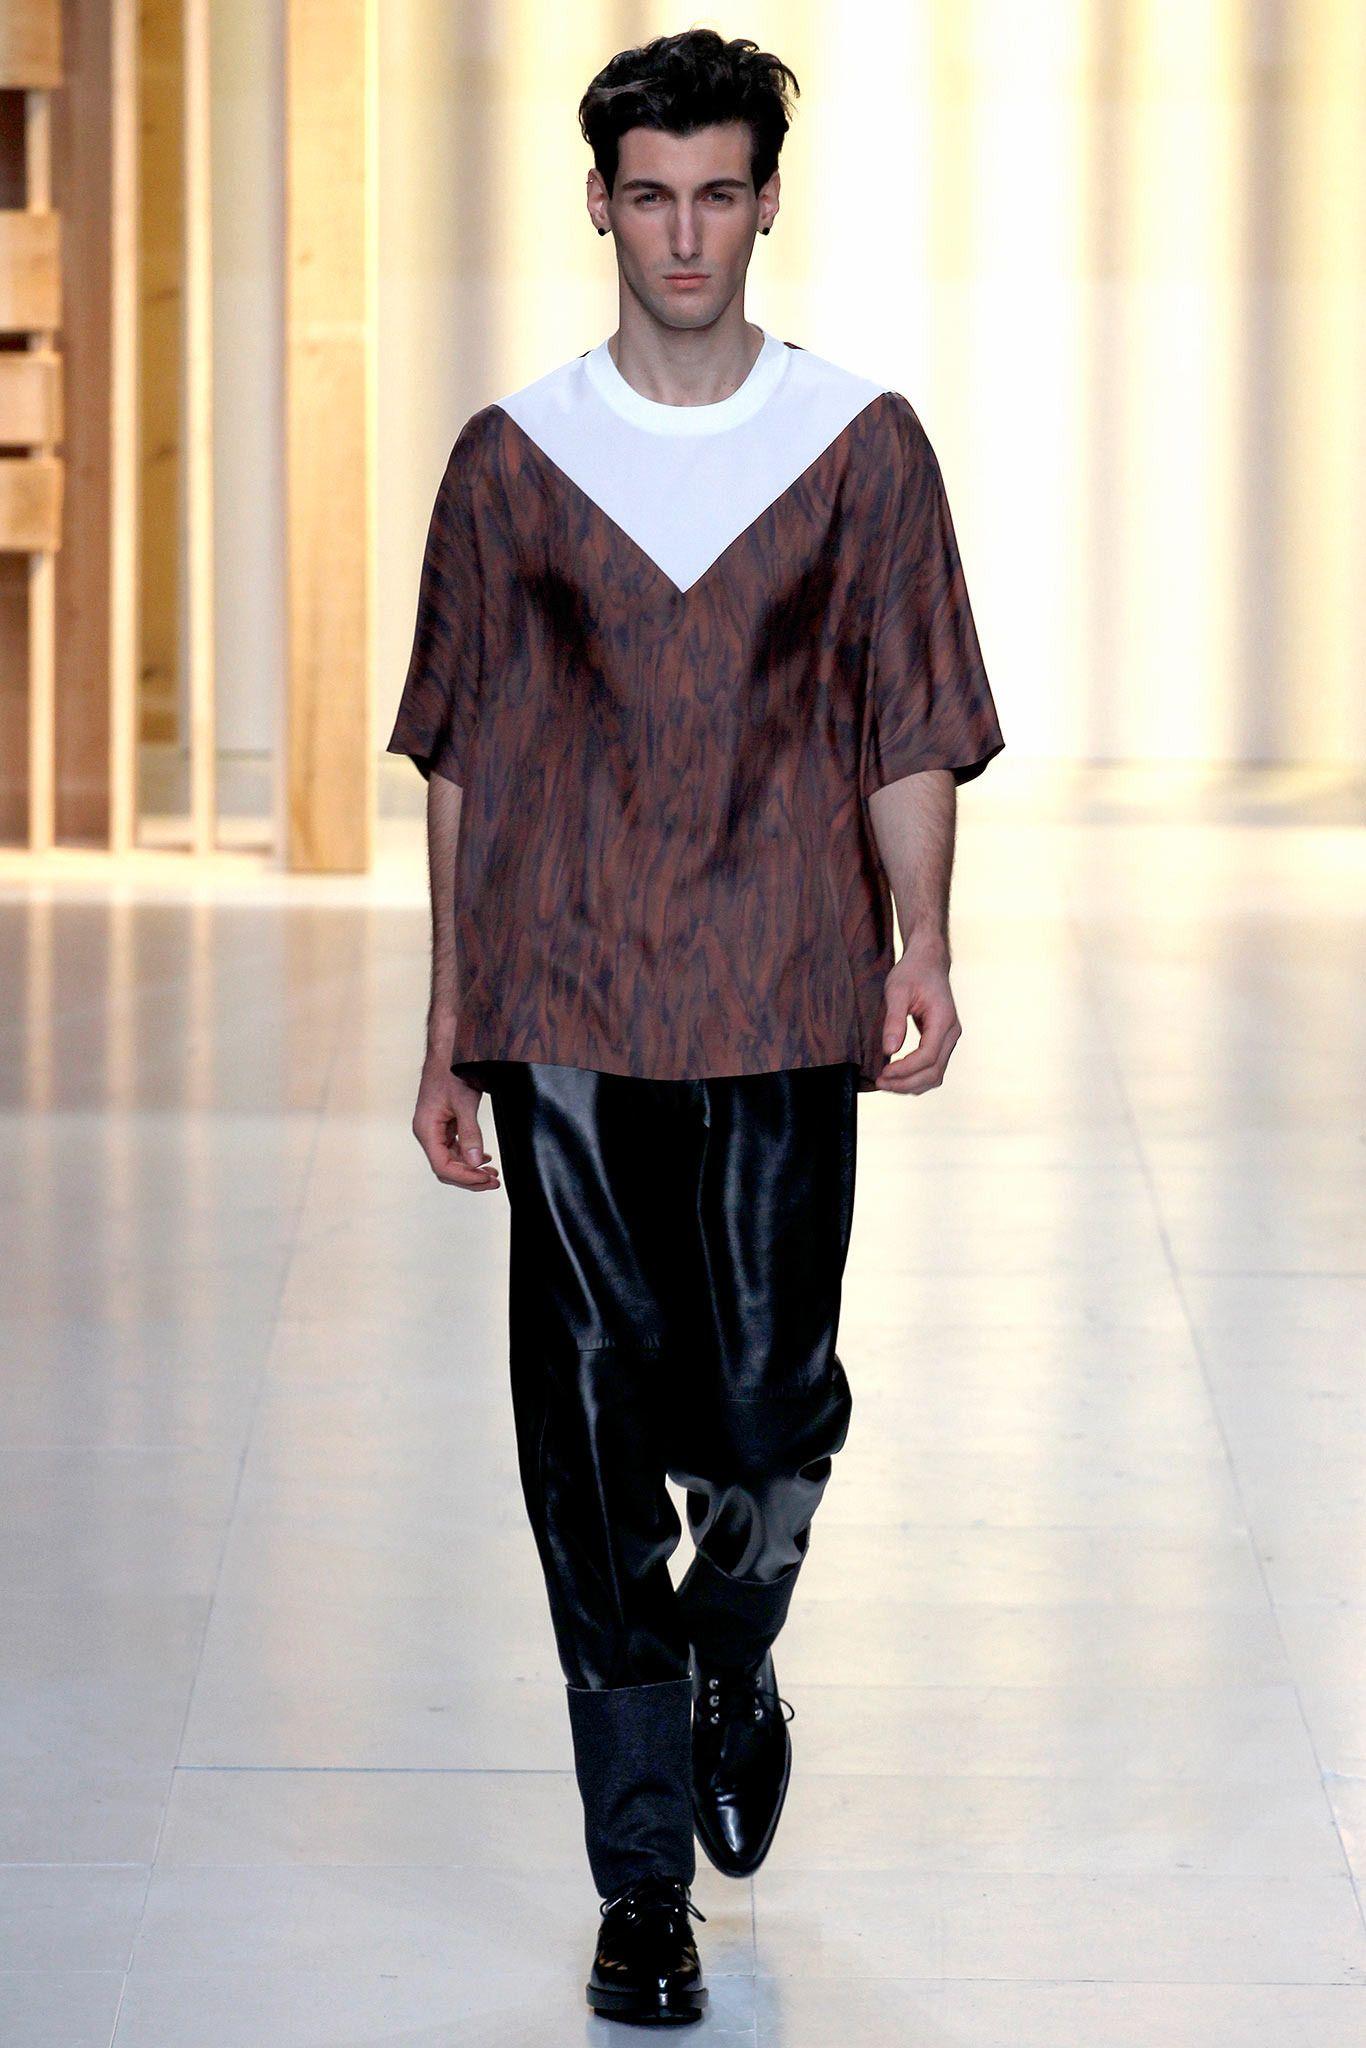 Fall 2014 Menswear - 3.1 Phillip Lim